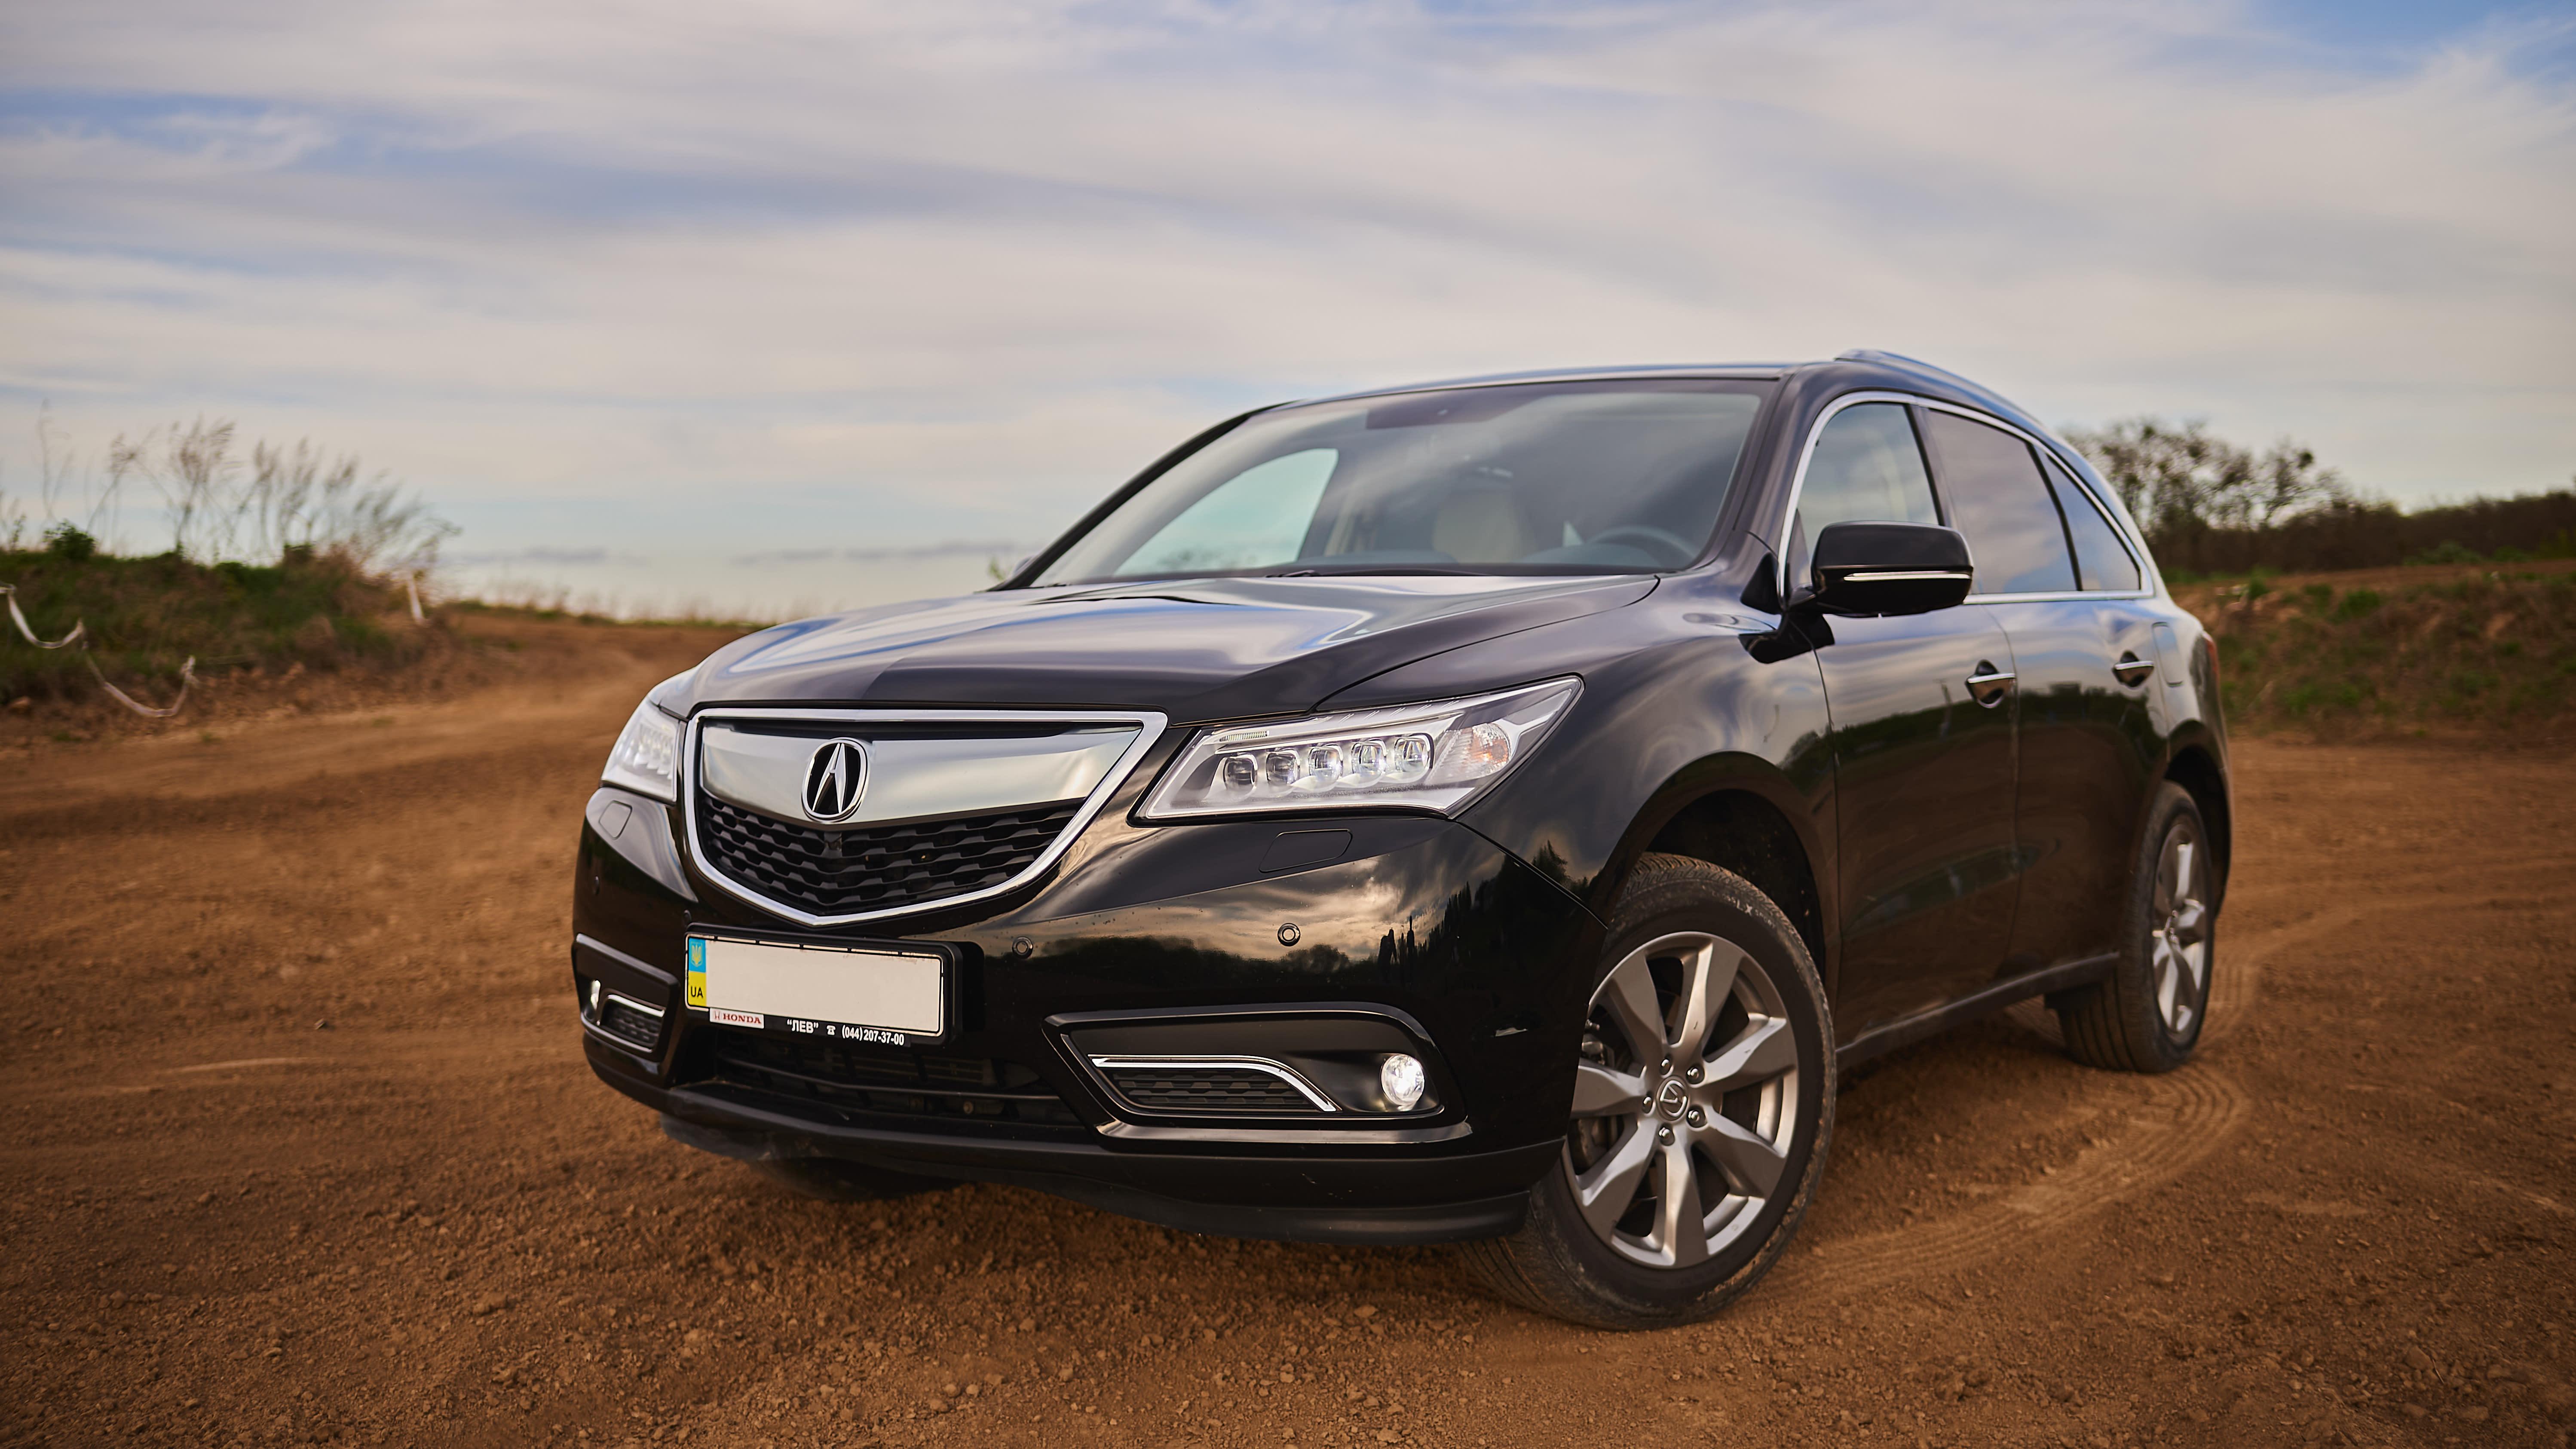 Honda recalls vehicles with defective seat features